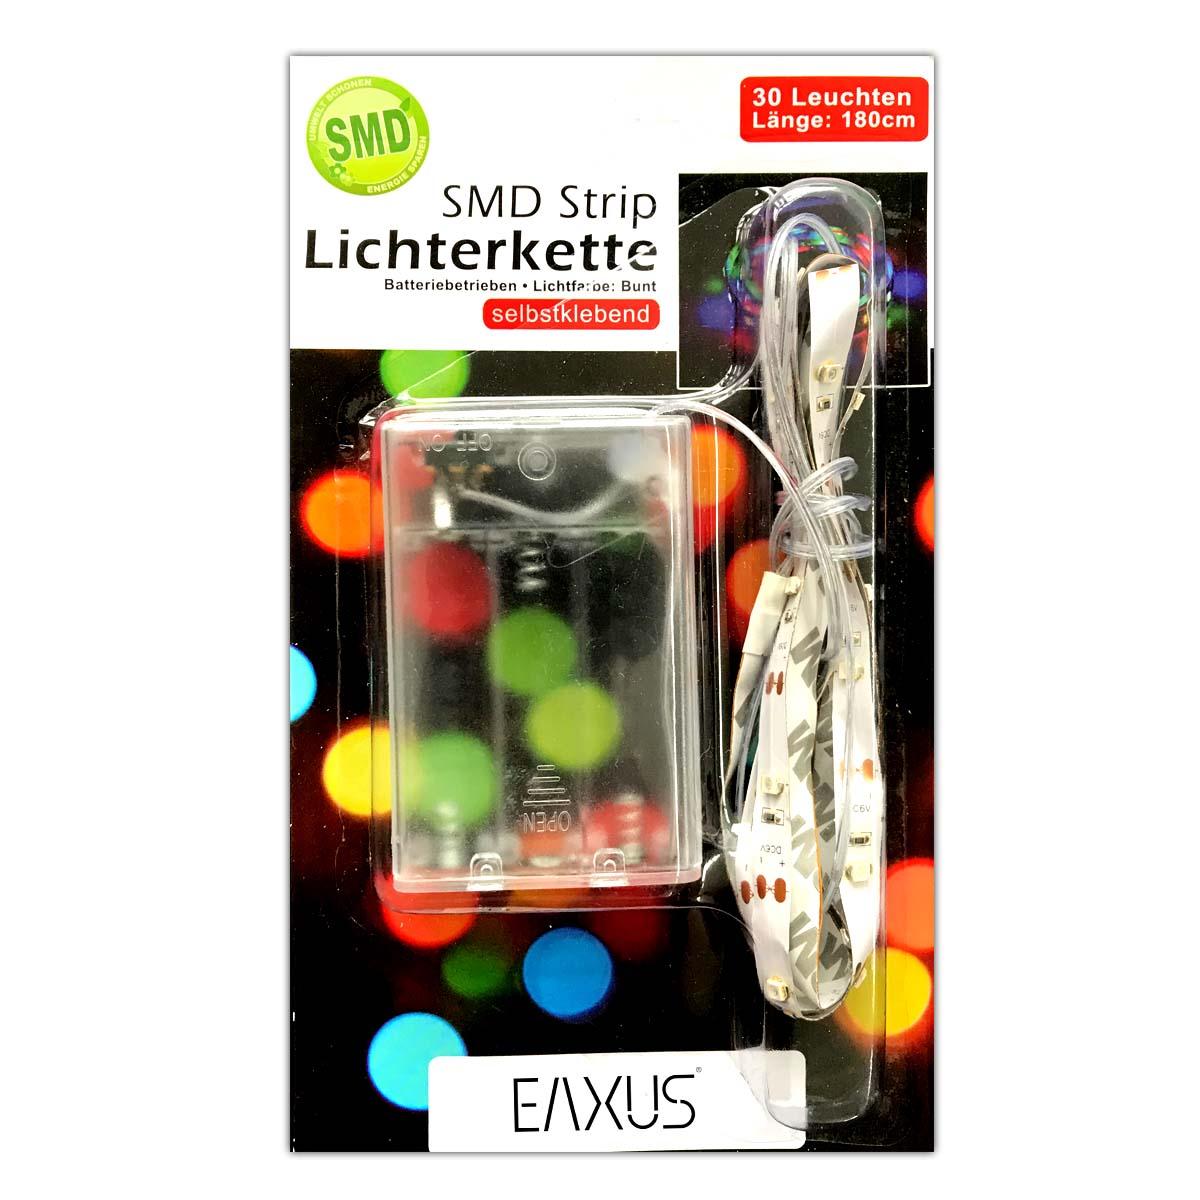 batterie lichtleiste bunt 30 smd lichterkette led streifen band strips kette ebay. Black Bedroom Furniture Sets. Home Design Ideas